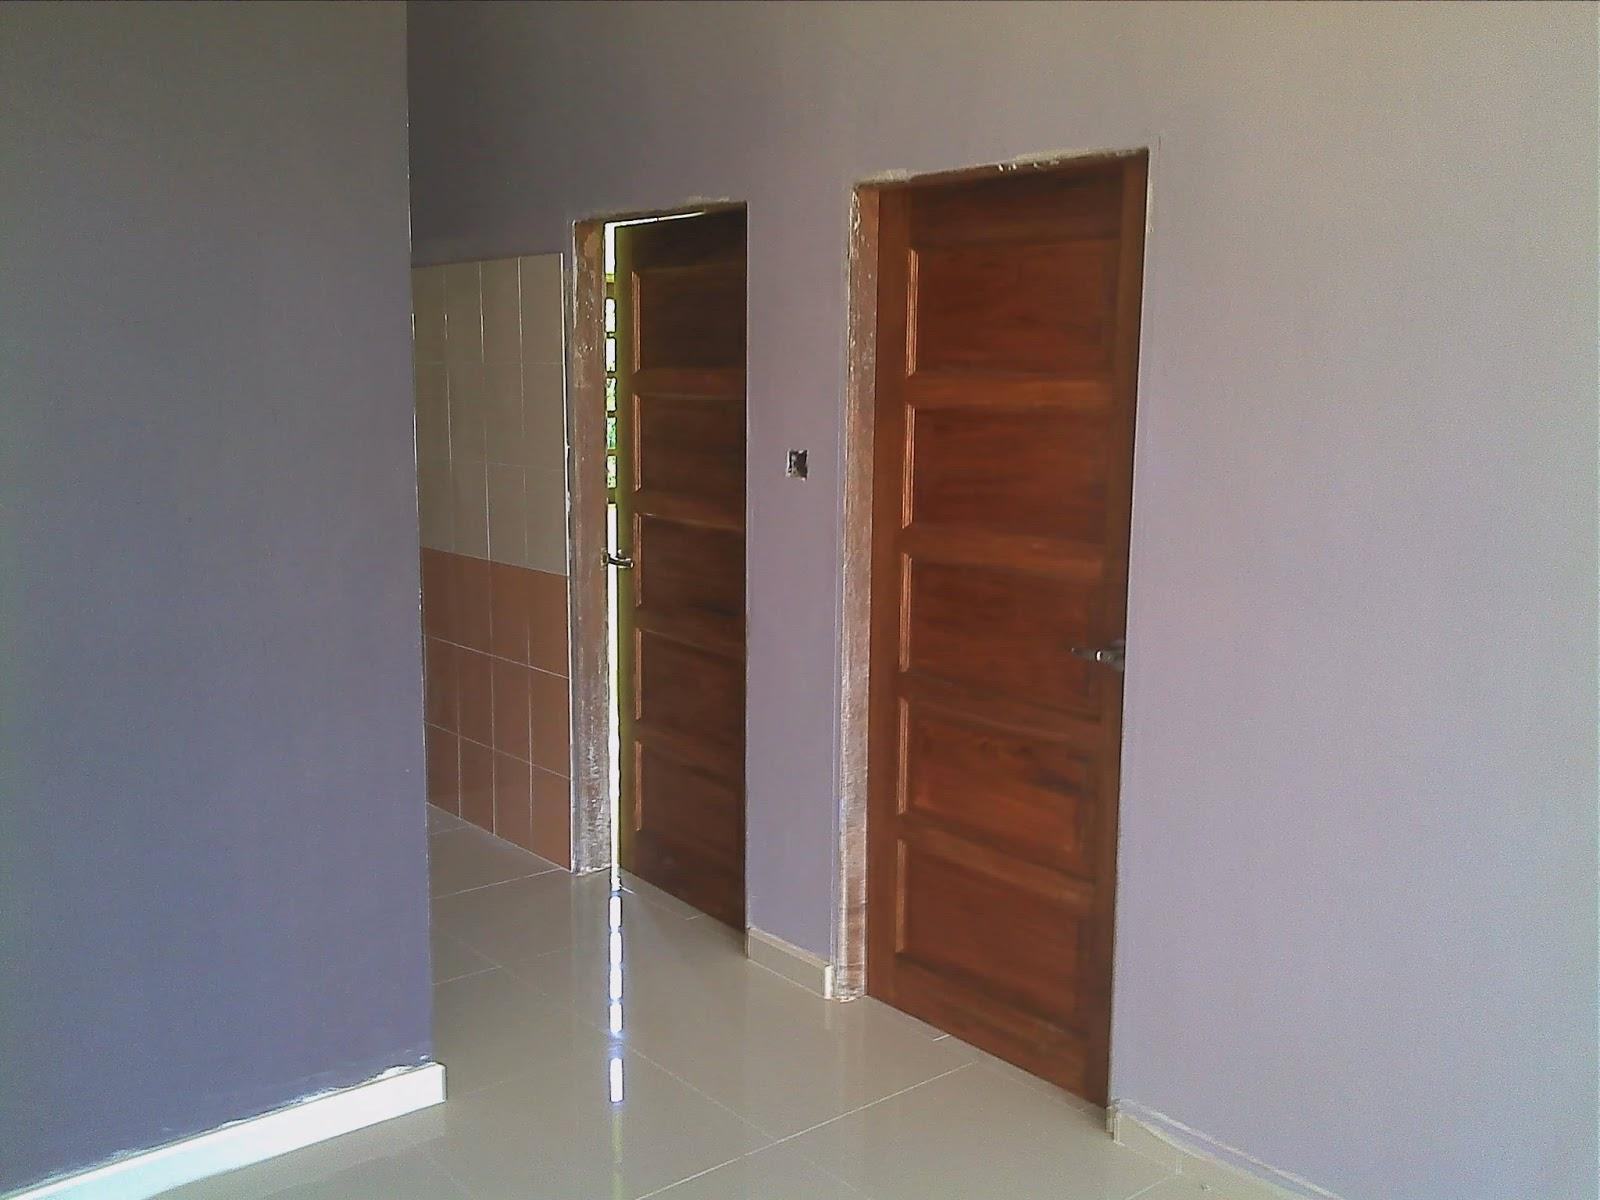 Pintu Jenis Kayu Nyatuh Untuk Bilik 4 Dan 5 Juga Telah Siap Dipasang